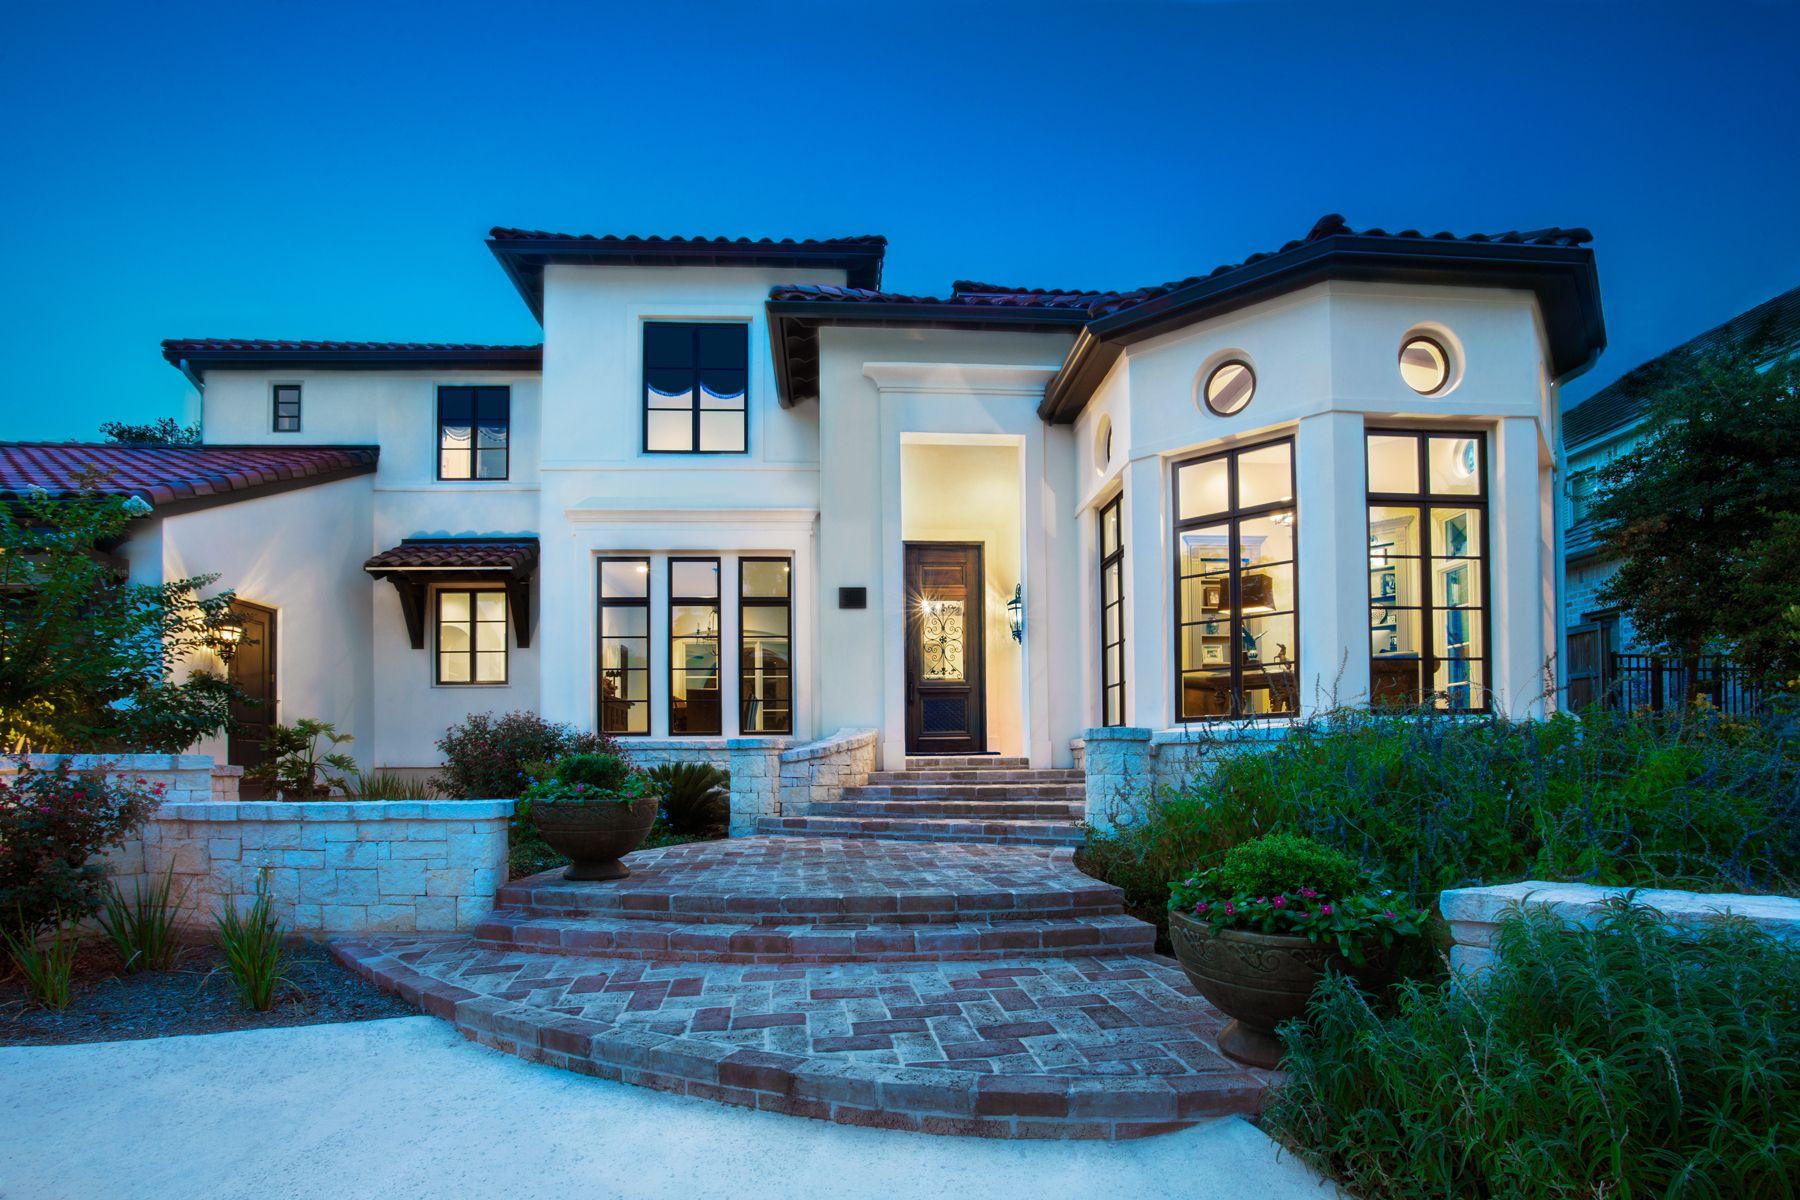 Custom Nic Abbey Luxury Home Luxury Homes Exterior Luxury Homes House Styles